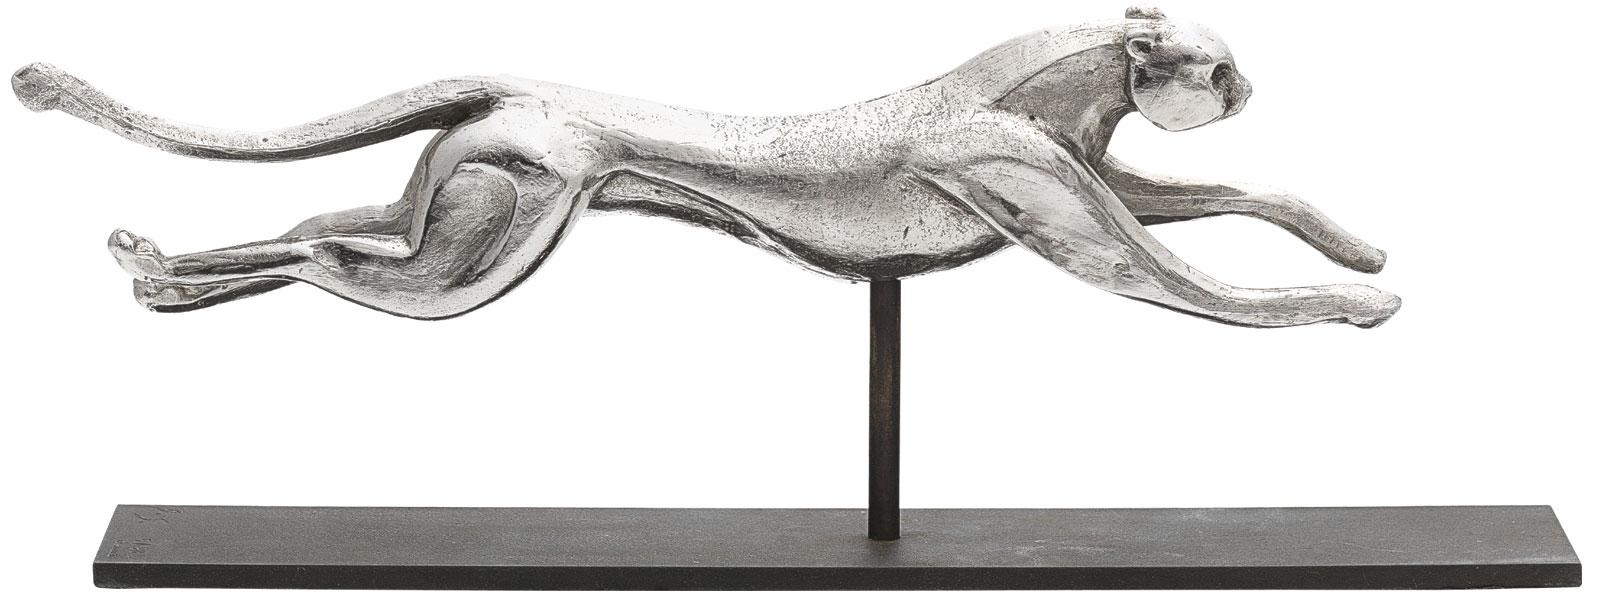 "Skulptur ""Gepard"", Metallguss versilbert"